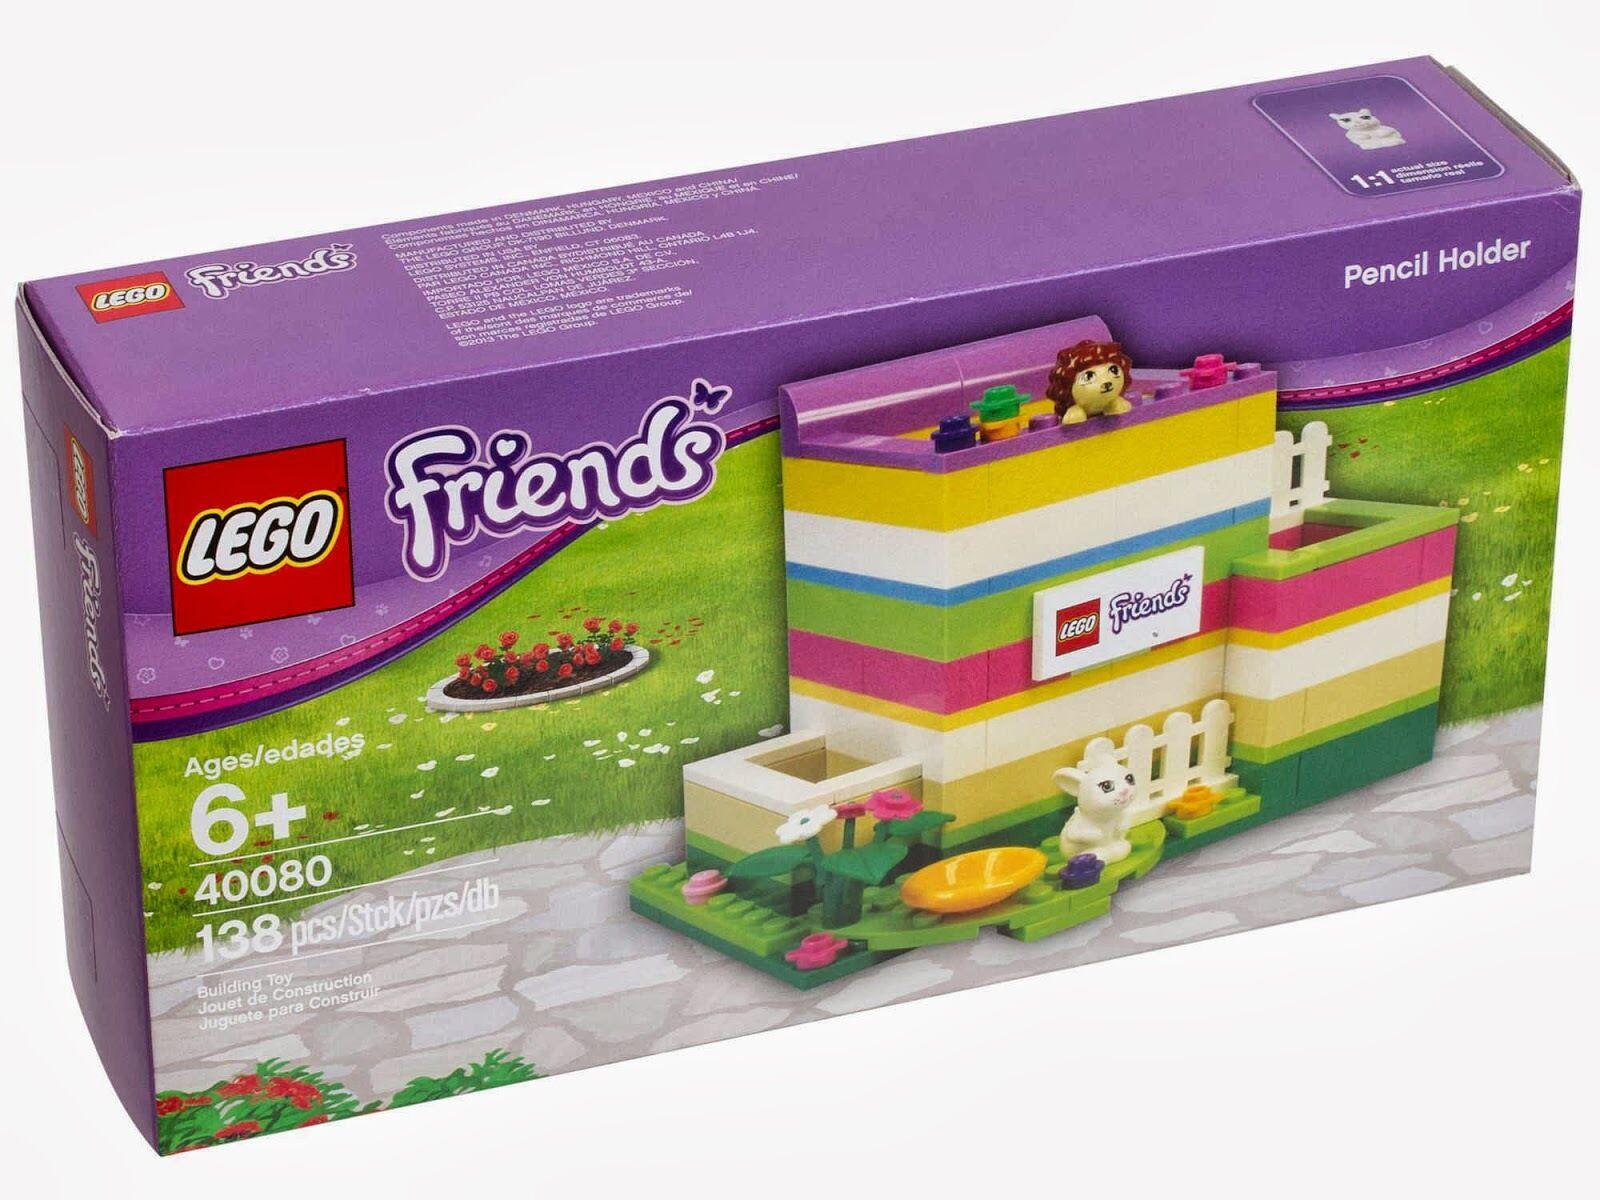 LEGO - Friends - Rare - 40080 Friends Pencil Holder - New & Sealed